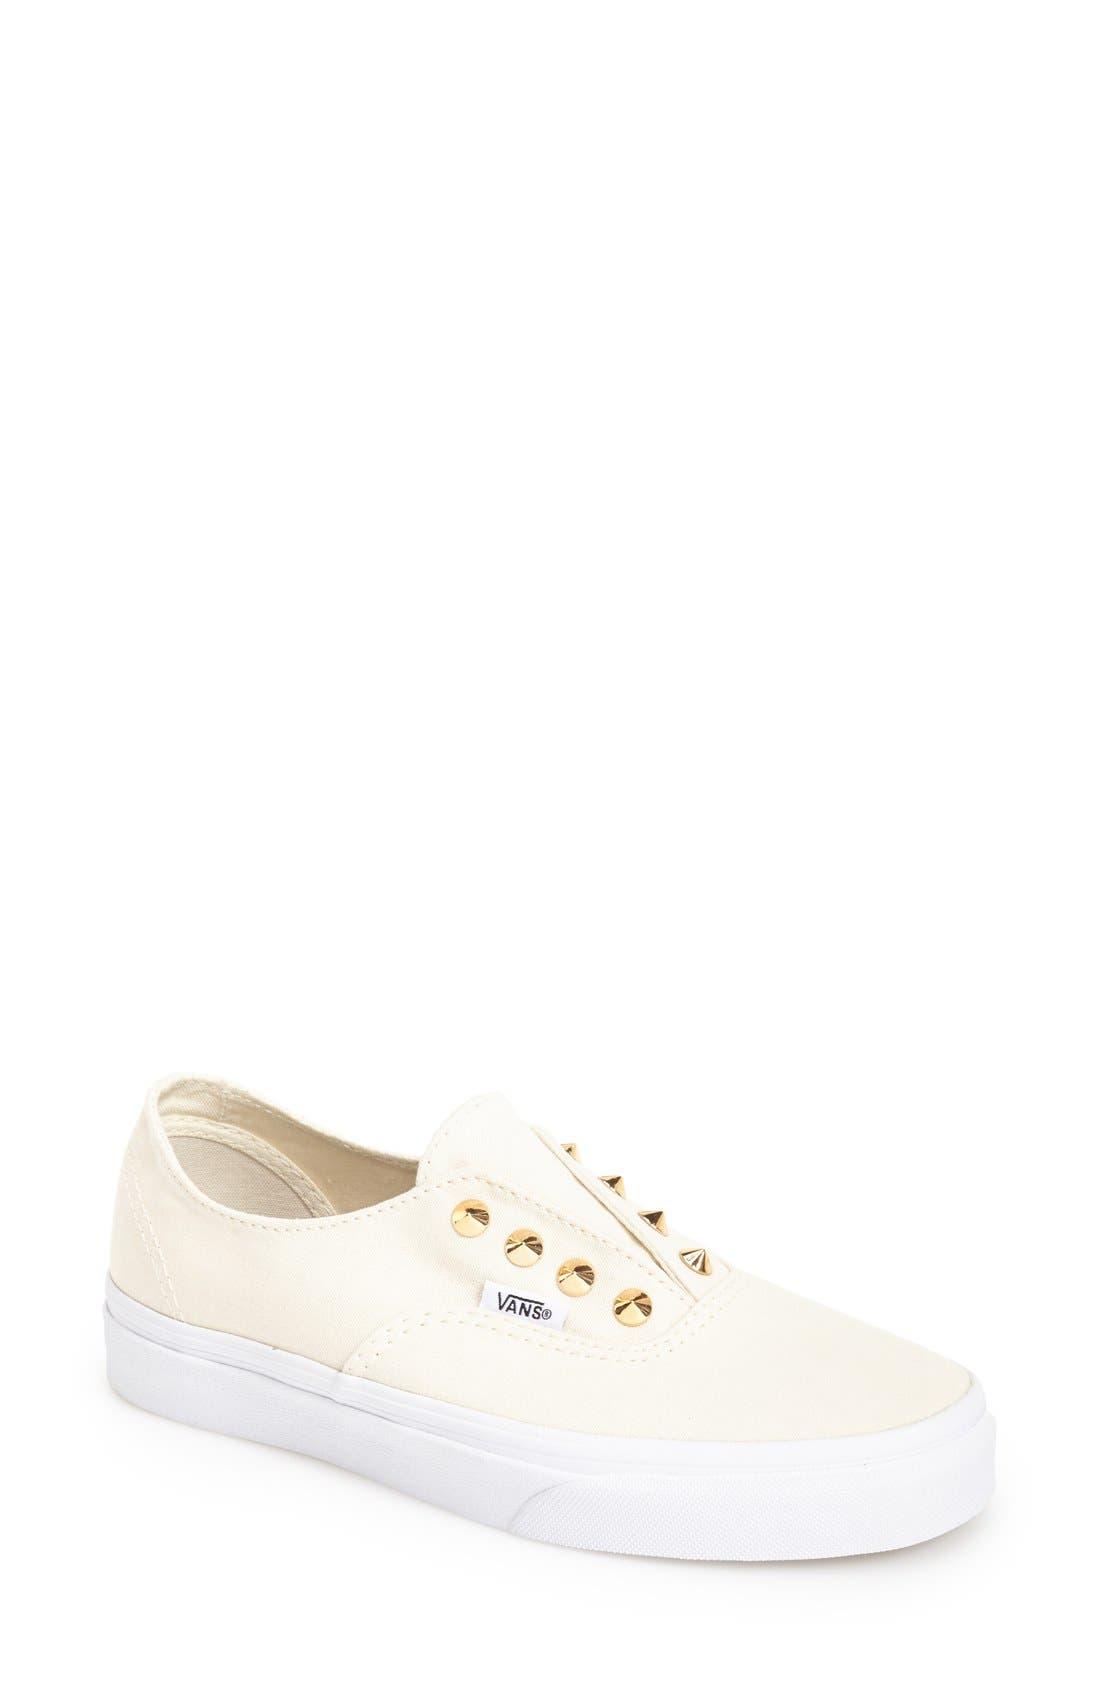 Main Image - Vans 'Authentic Gore - Studs' Slip-On Sneaker (Women)